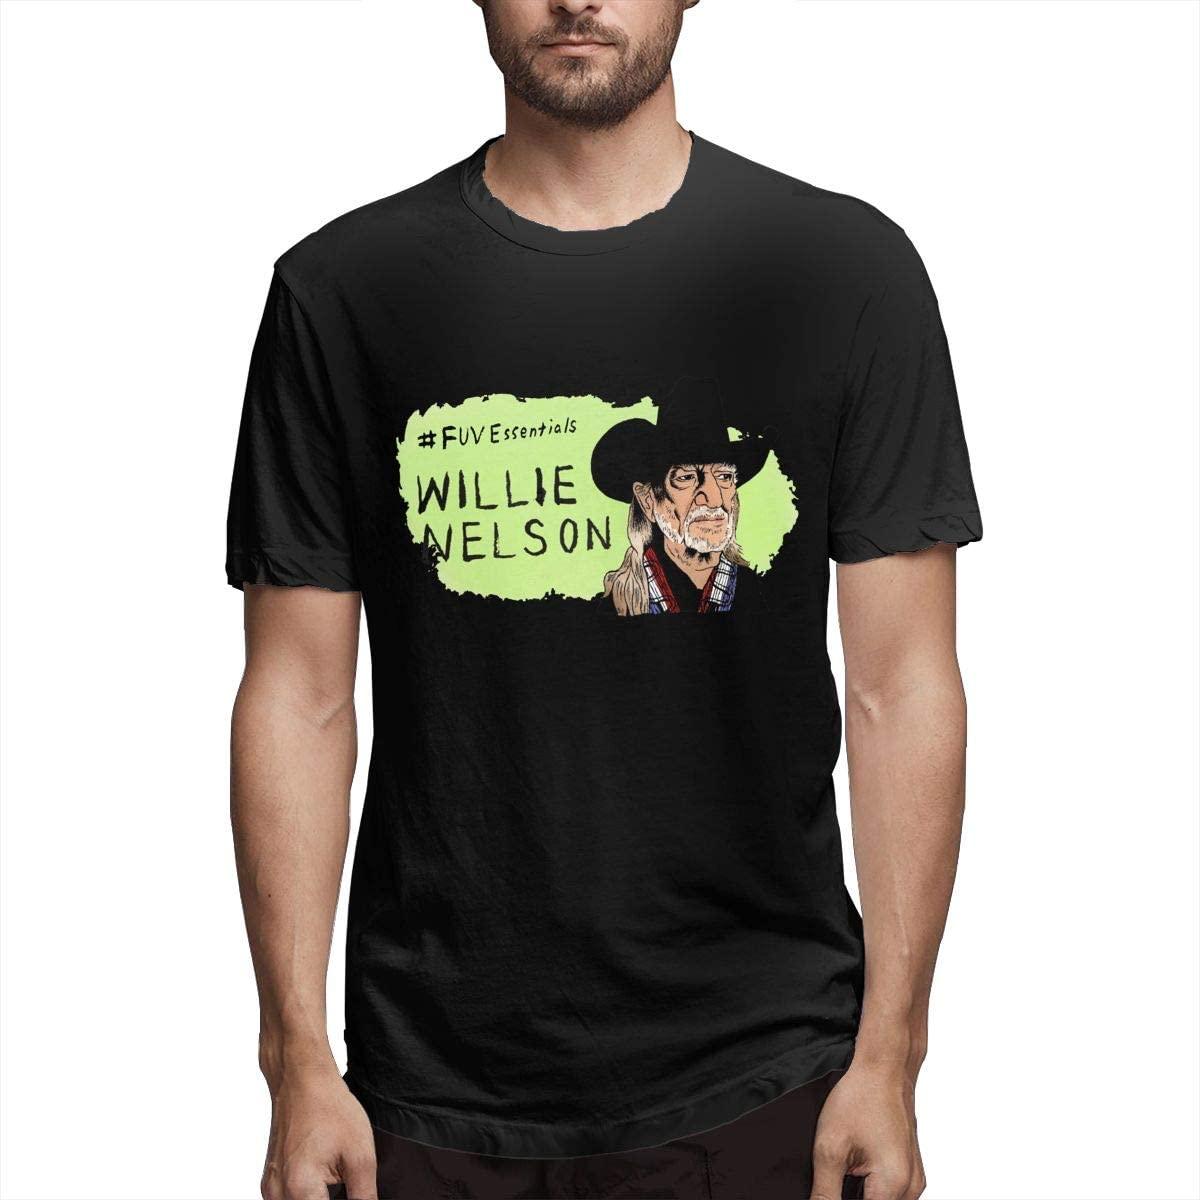 Willie Nelson Men's Short Sleeve T-Shirts Crew Neck Cotton Casual Tee Undershirt Black